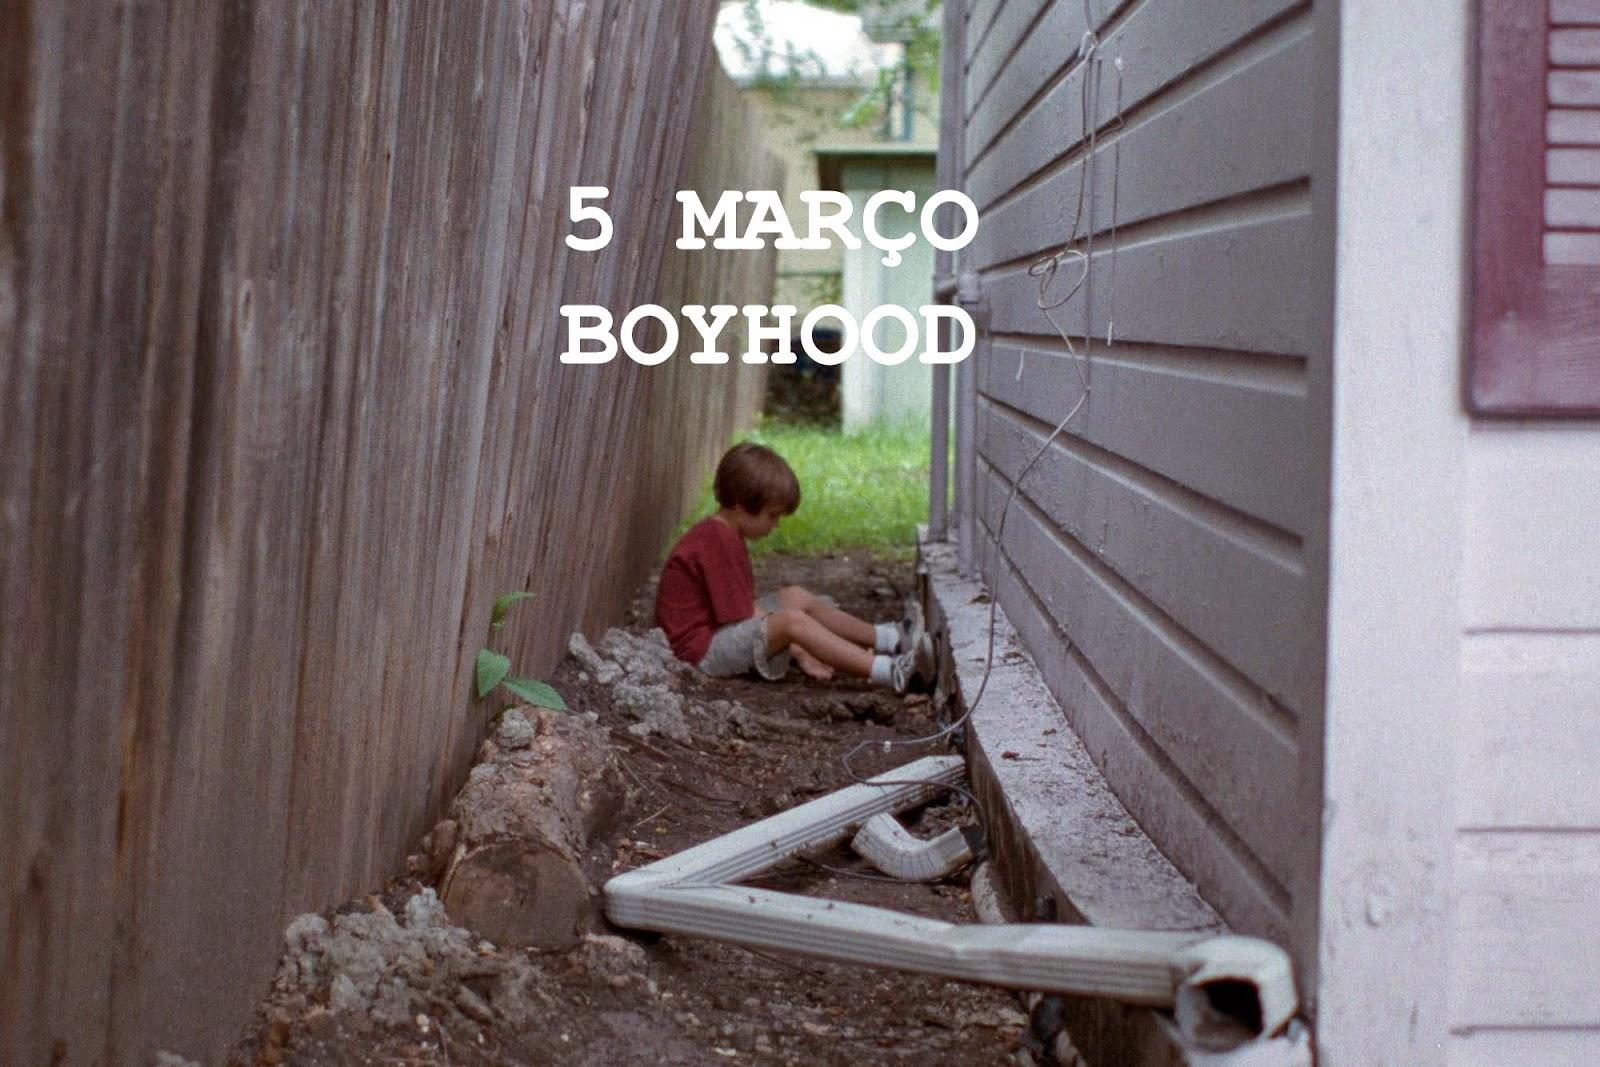 Boyhood - Momentos de Uma Vida - Boyhood (2014)